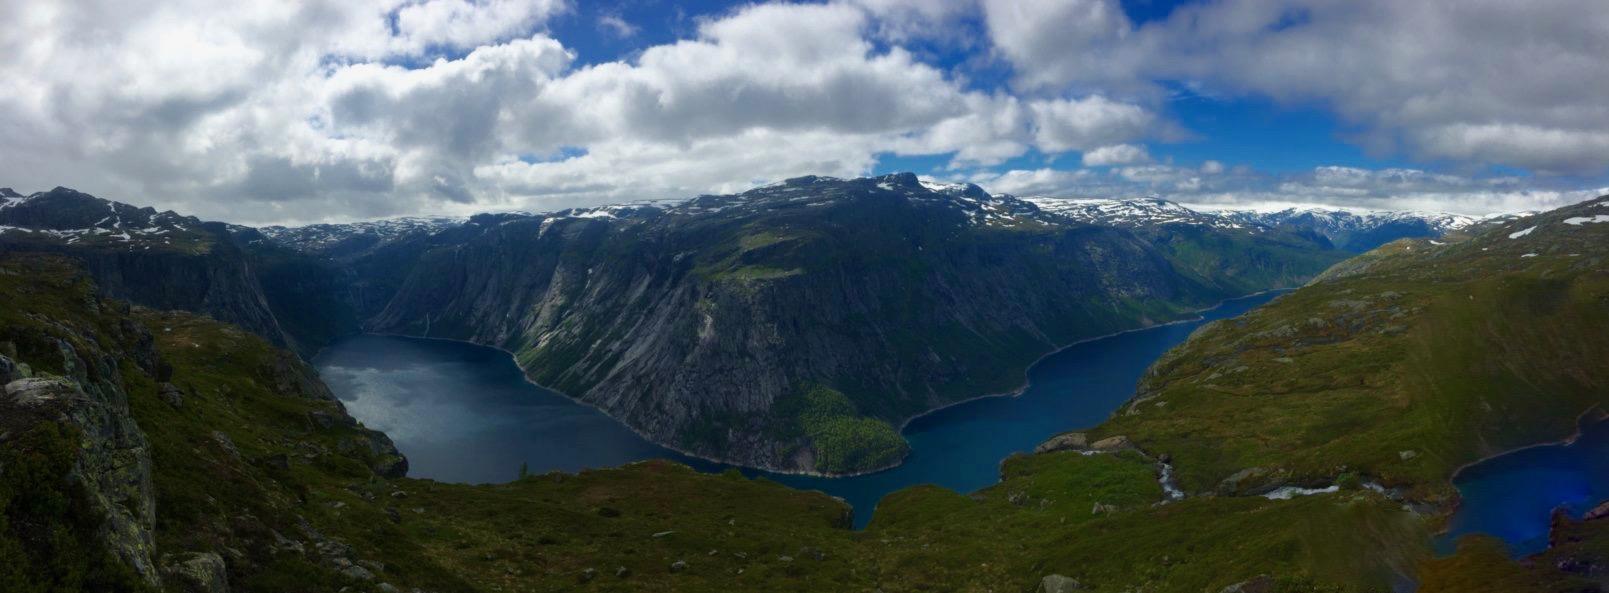 Troll Tunga and Lake Ringedalsvatnet